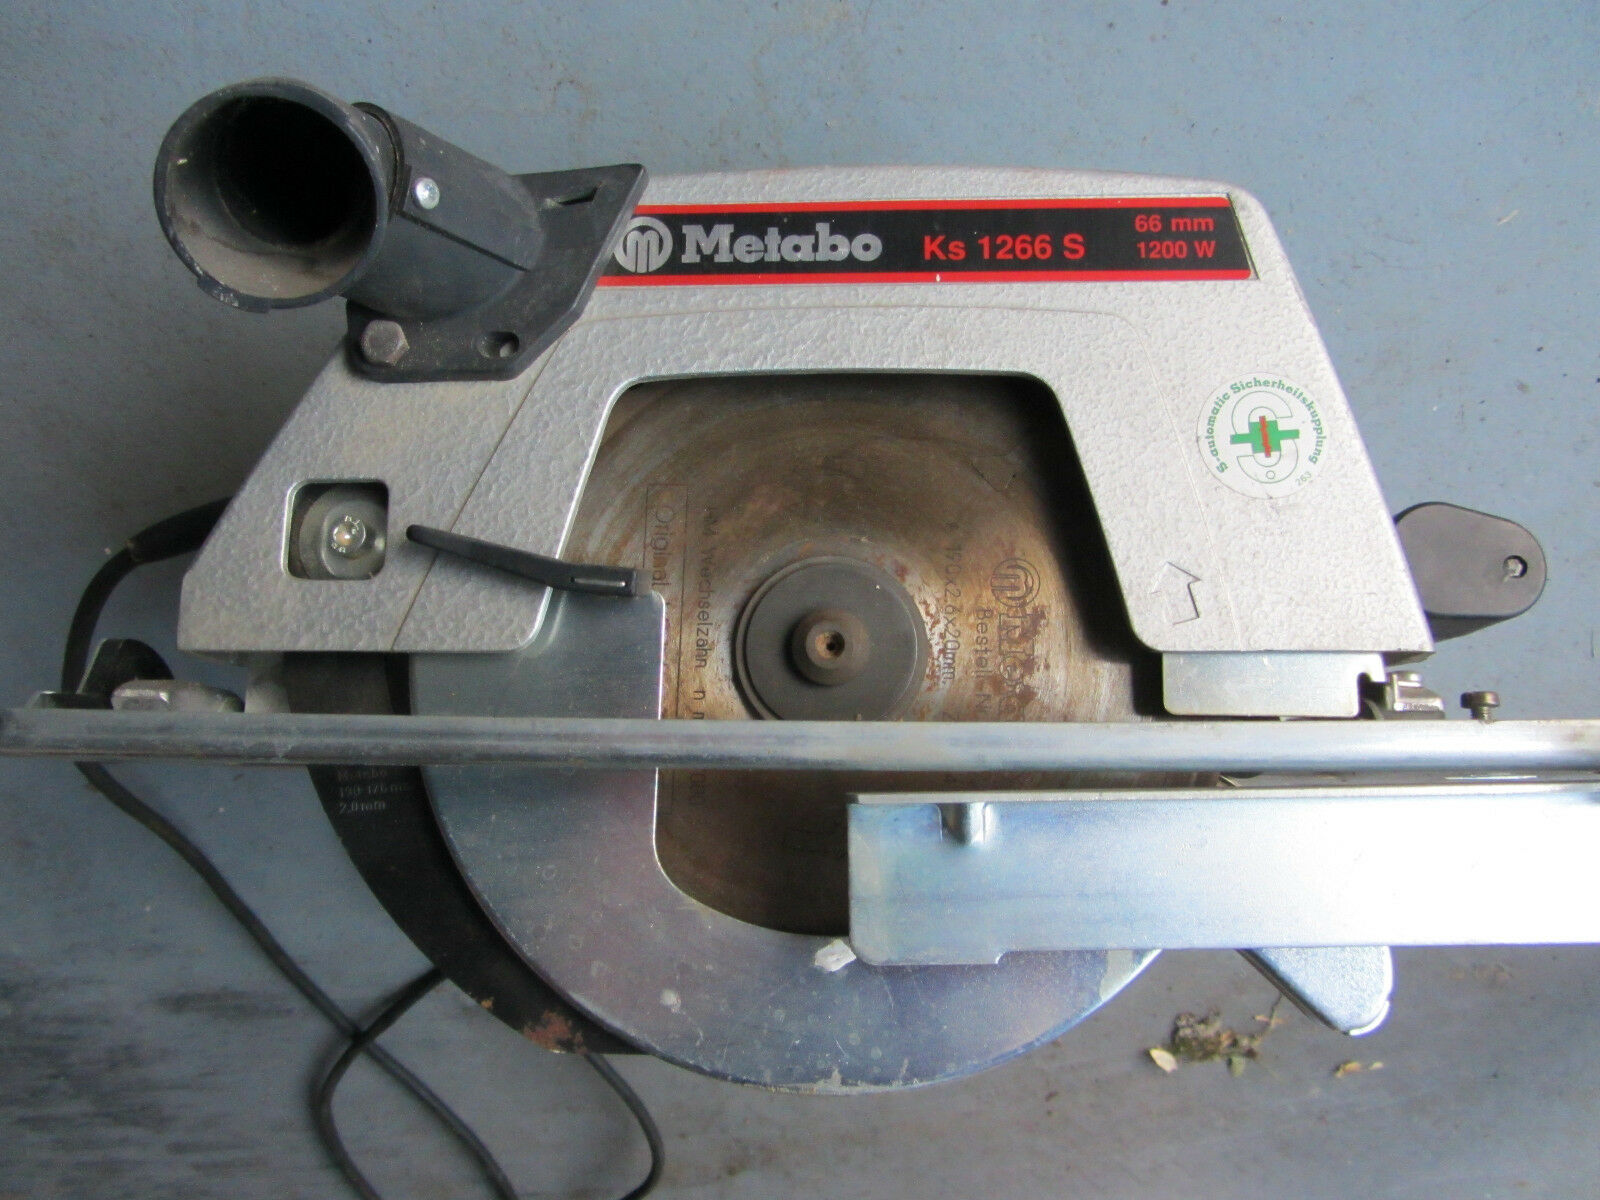 METABO Handkreissäge KS 1266 S gebraucht, funktionsfähig